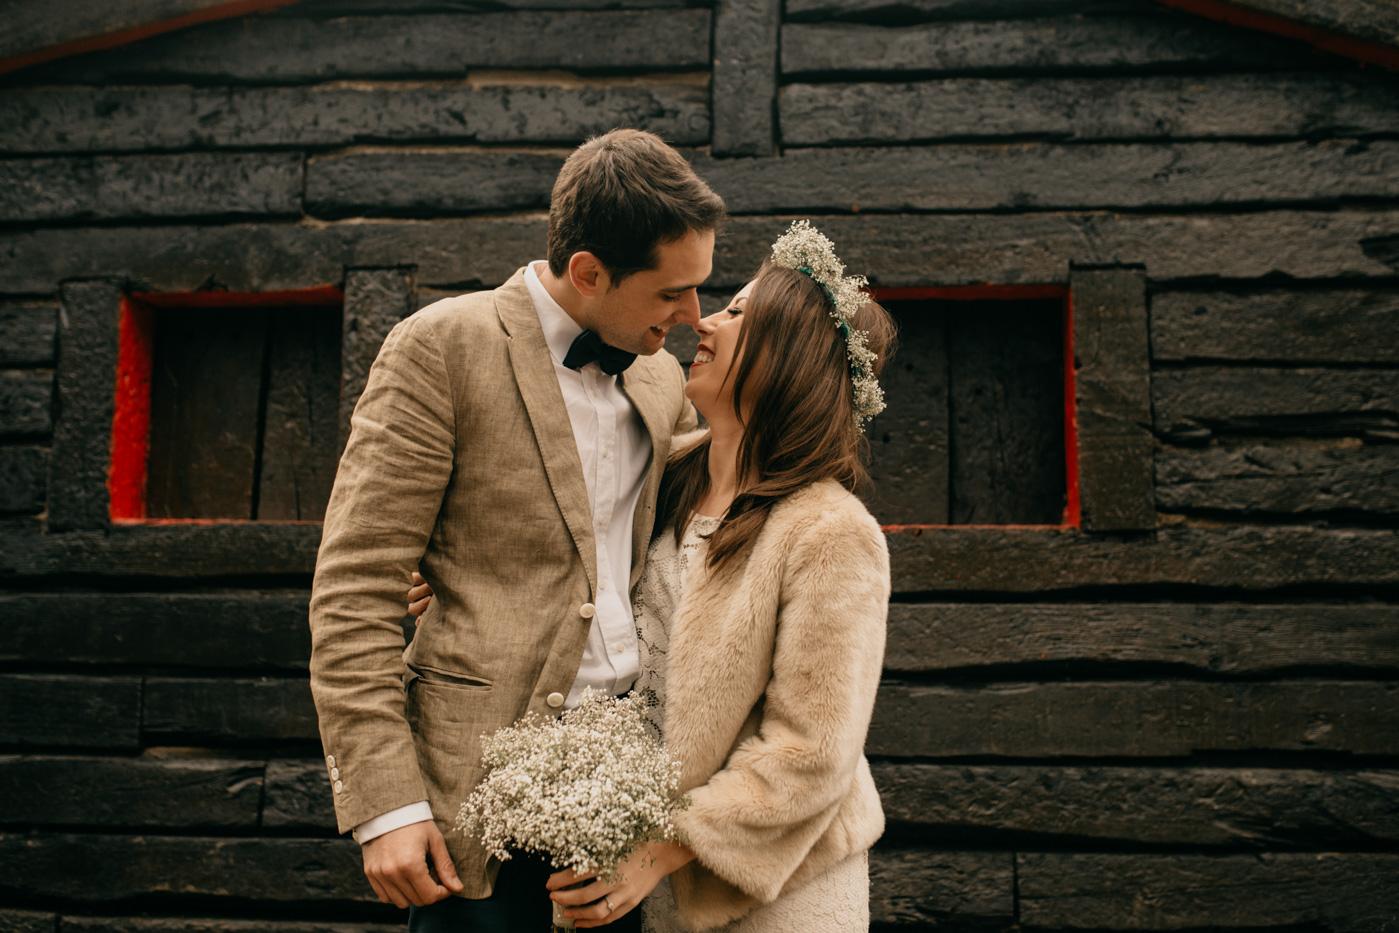 Velvet-Hush-fotografos-boda-al-aire-libre-madrid-095